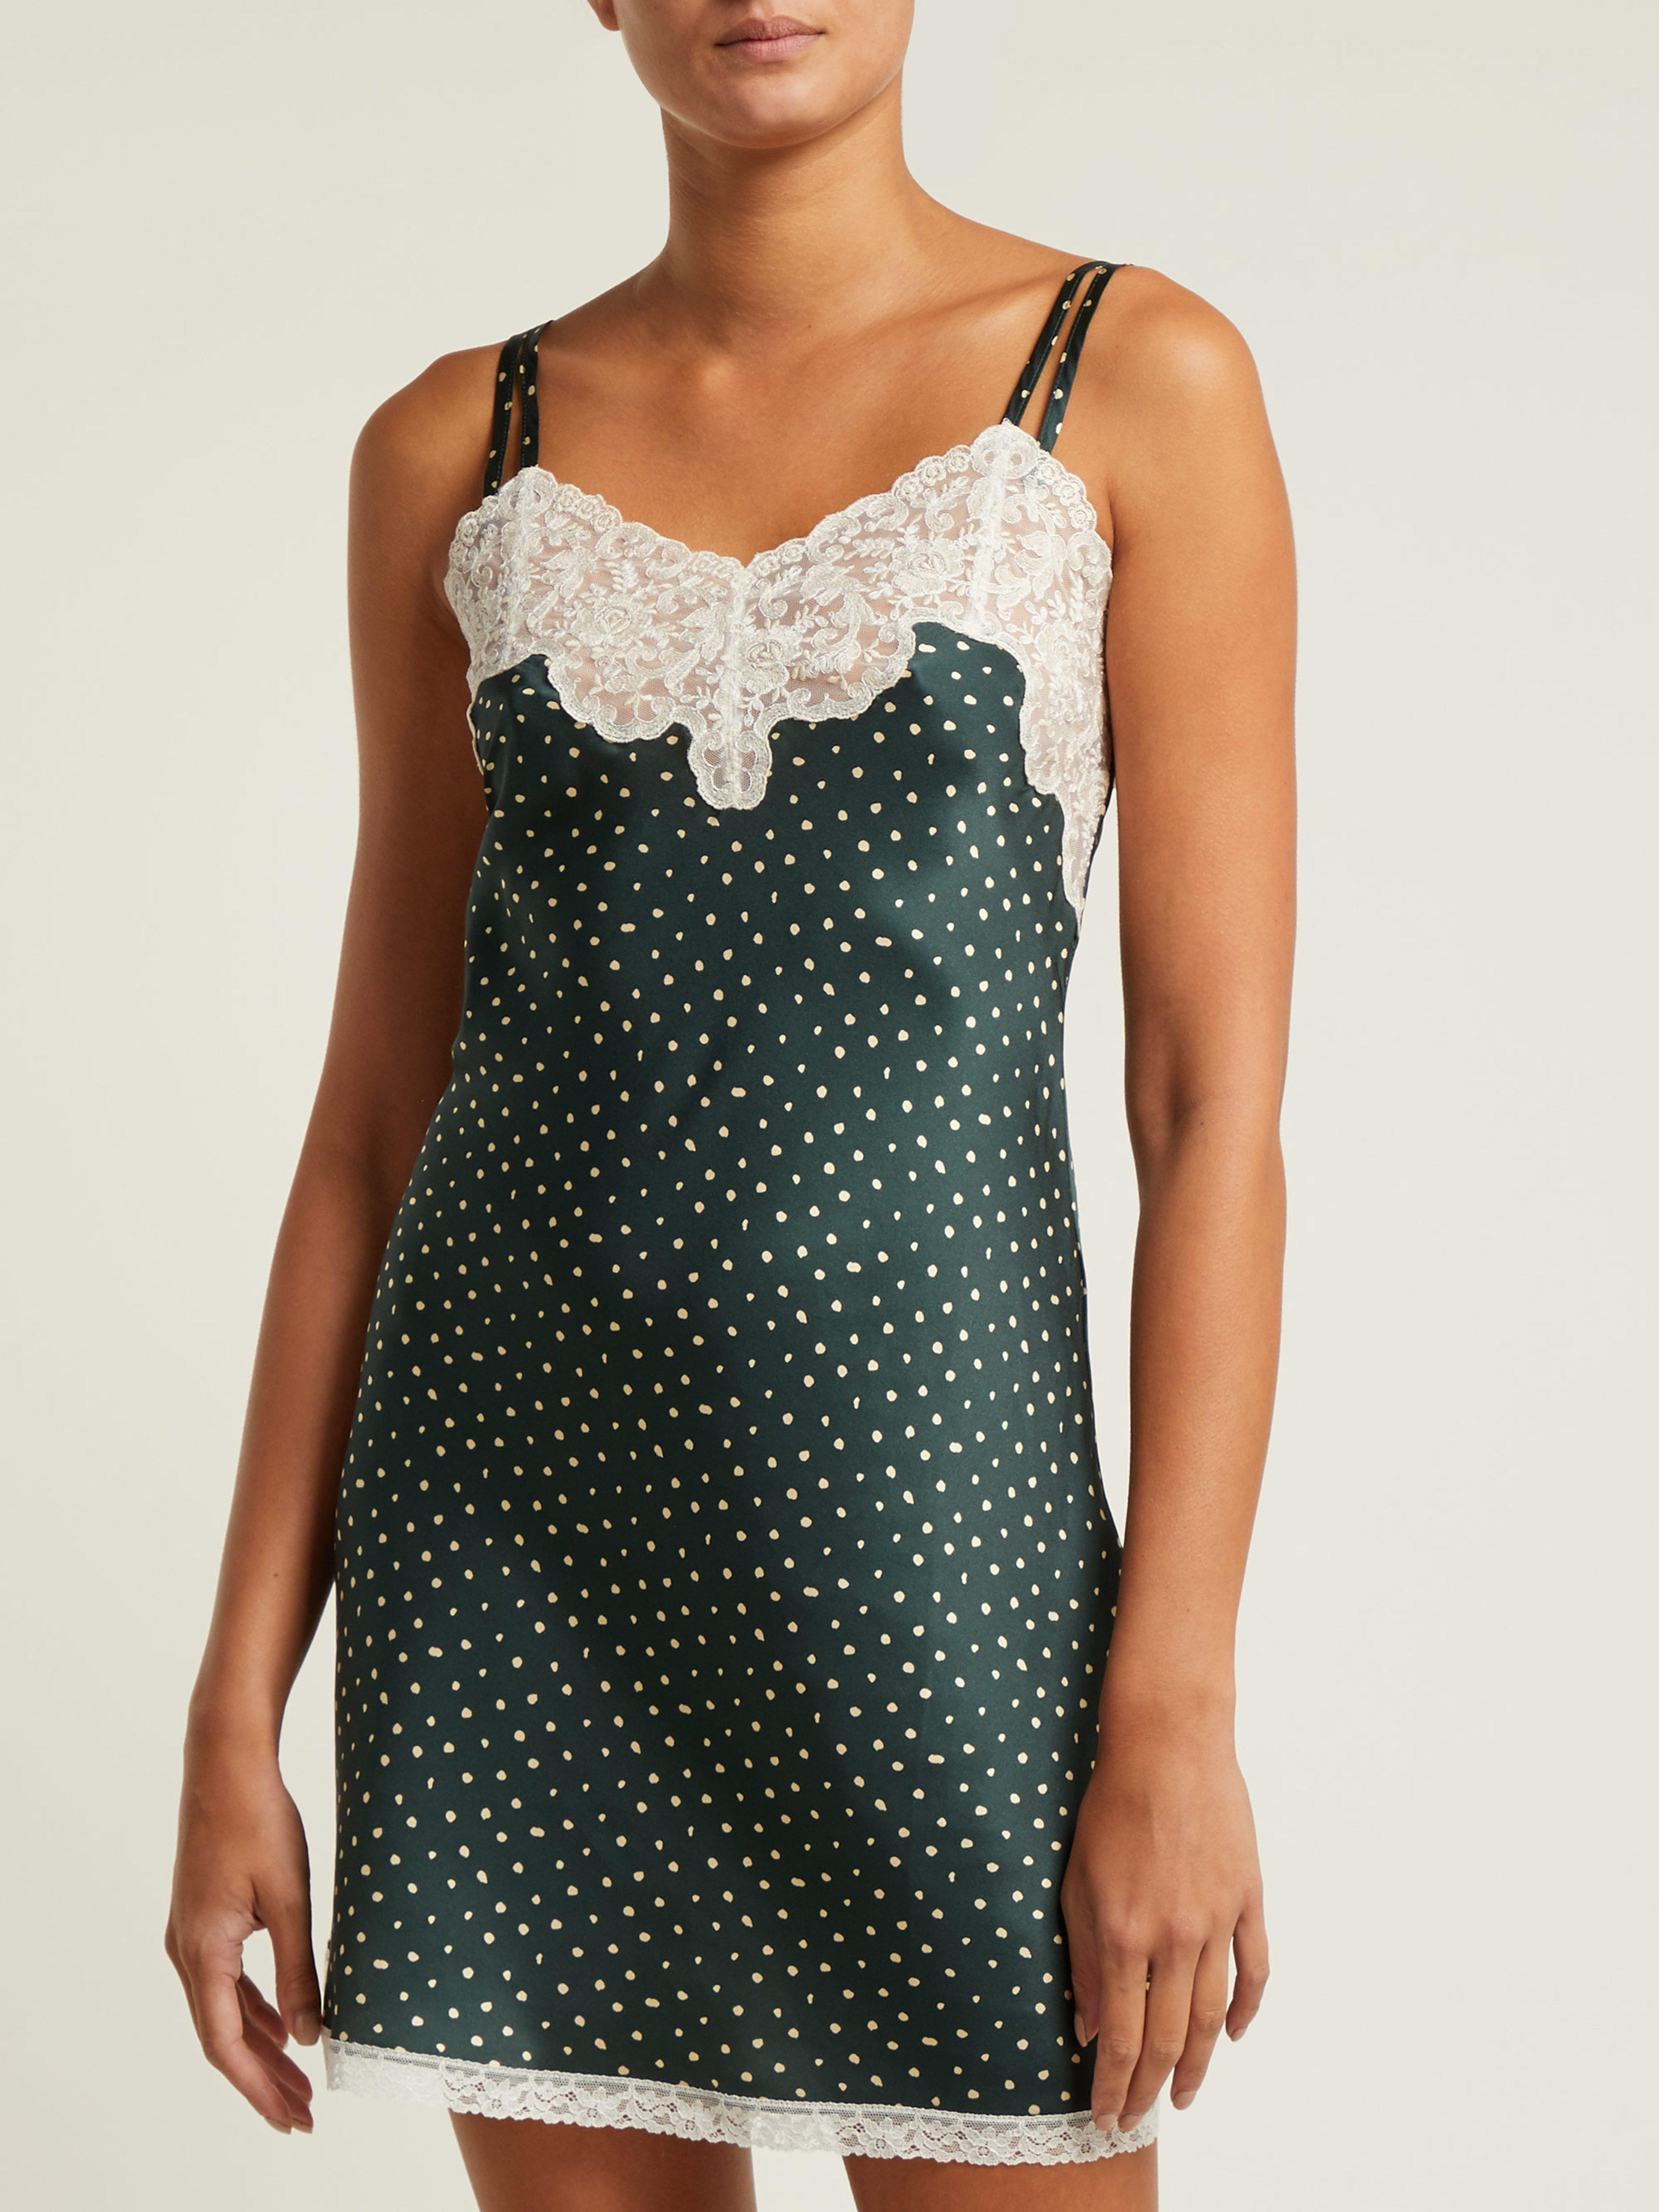 Morpho + Luna Margot Silk Nightdress in Green Print (Green)